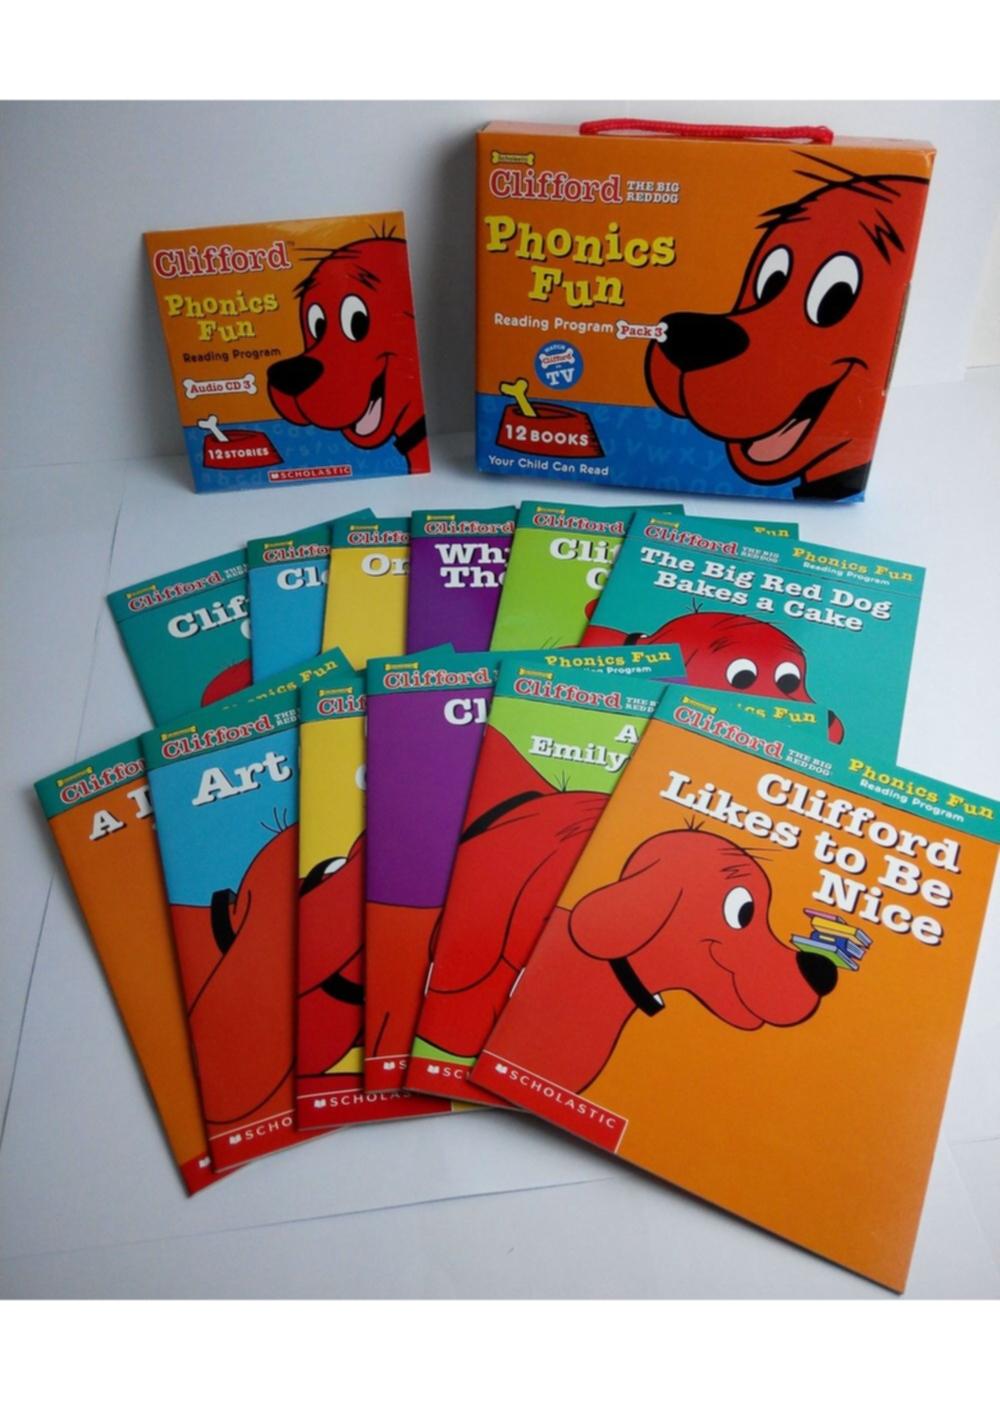 Clifford Phonics Fun: Reading Program Pack 3 (12 Books+CD)